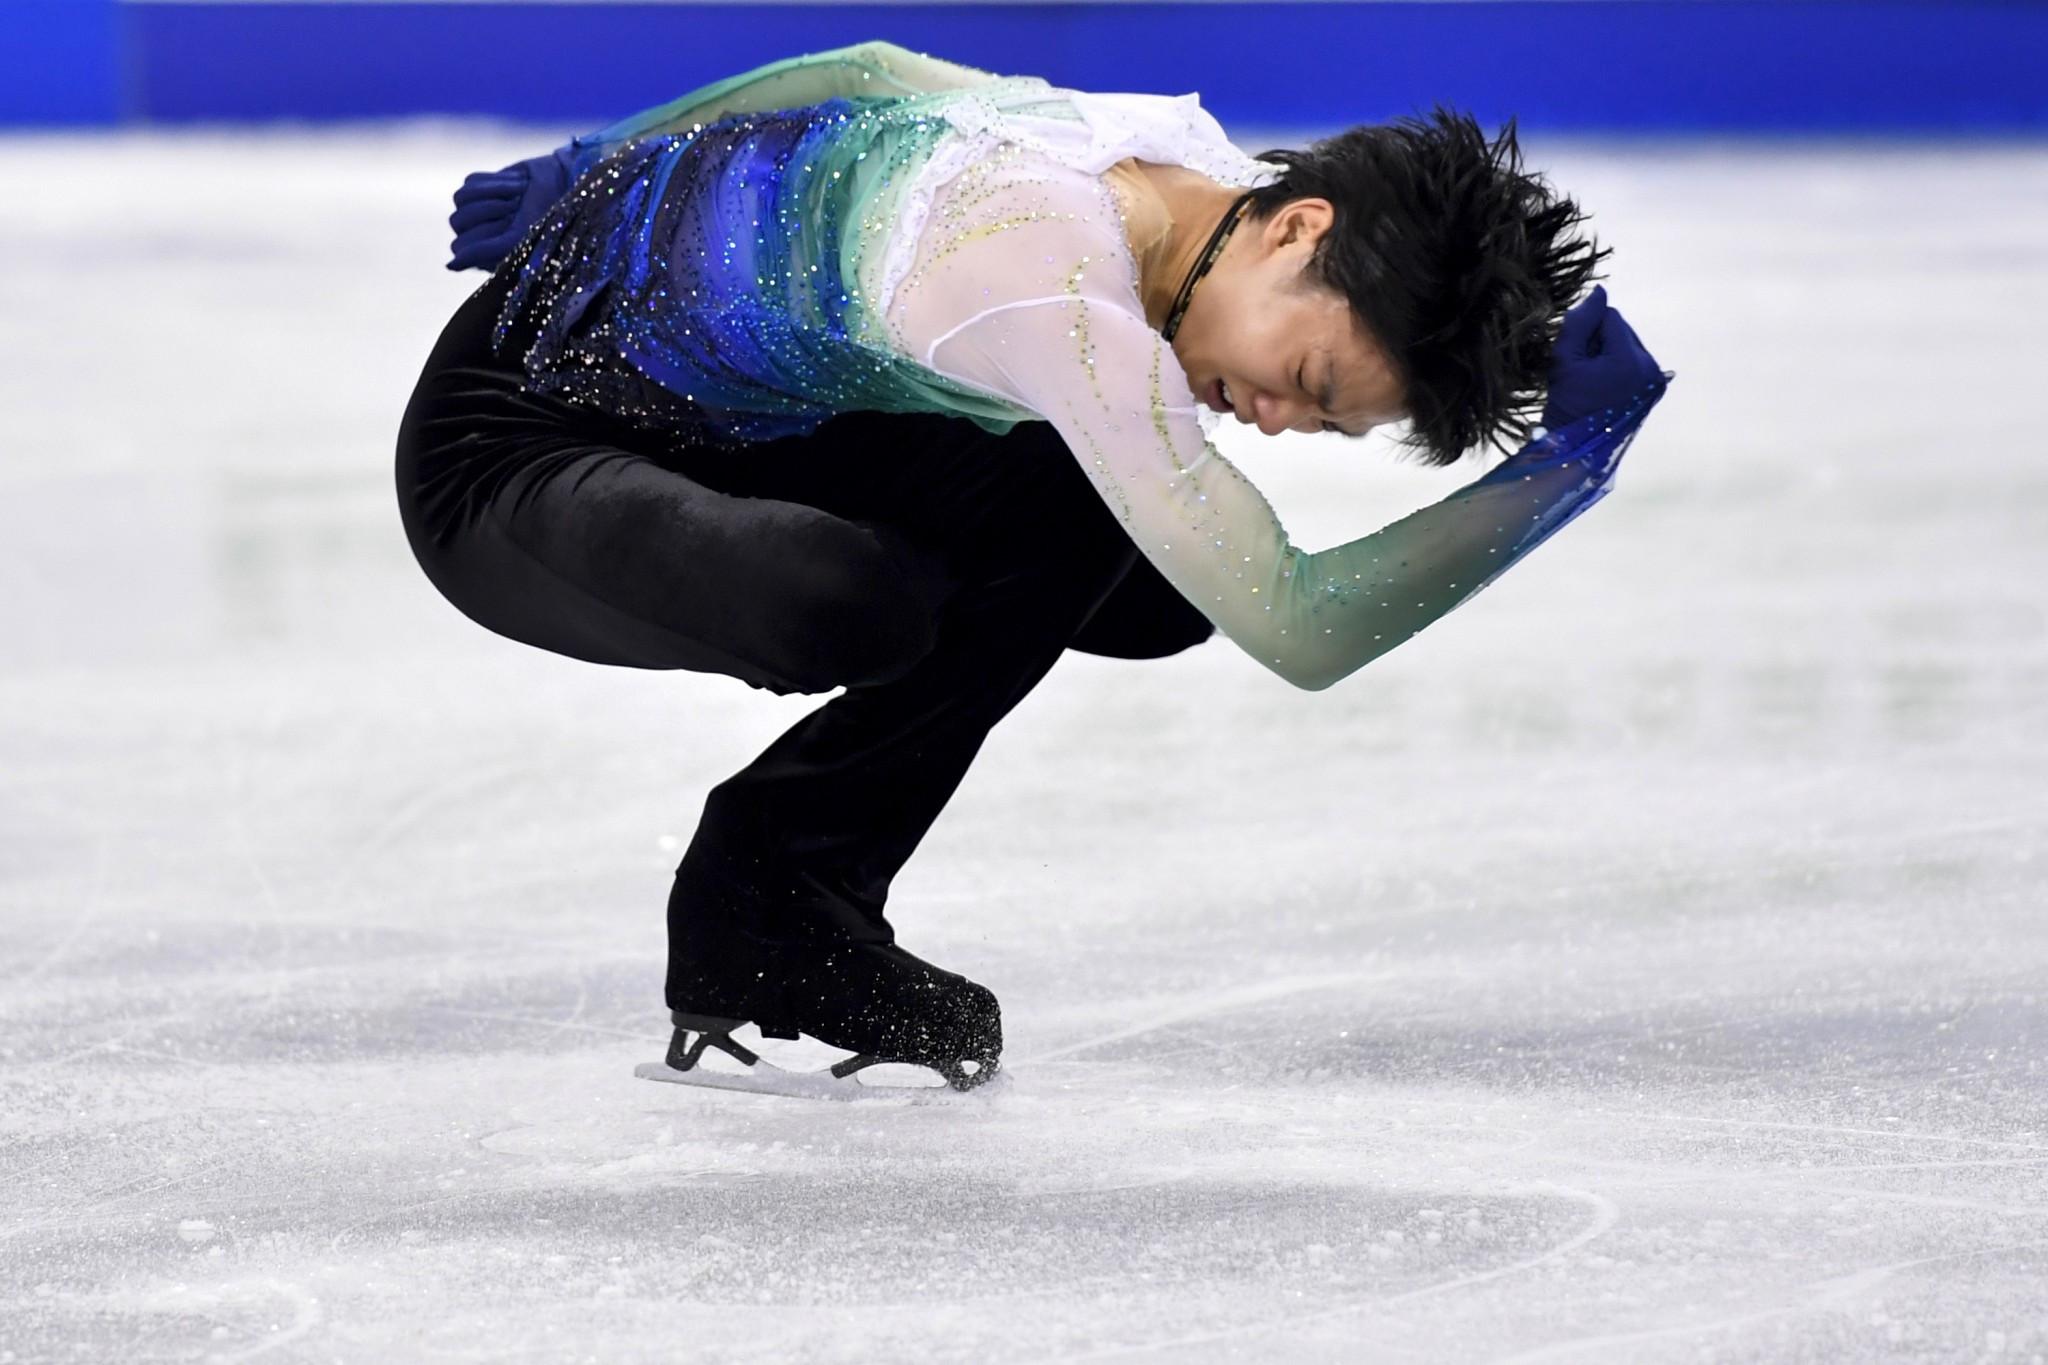 Yuzuru Hanyu will skate to the soundtrack from the 2001 film Onmyoji: The Yin-Yang Master ©Getty Images